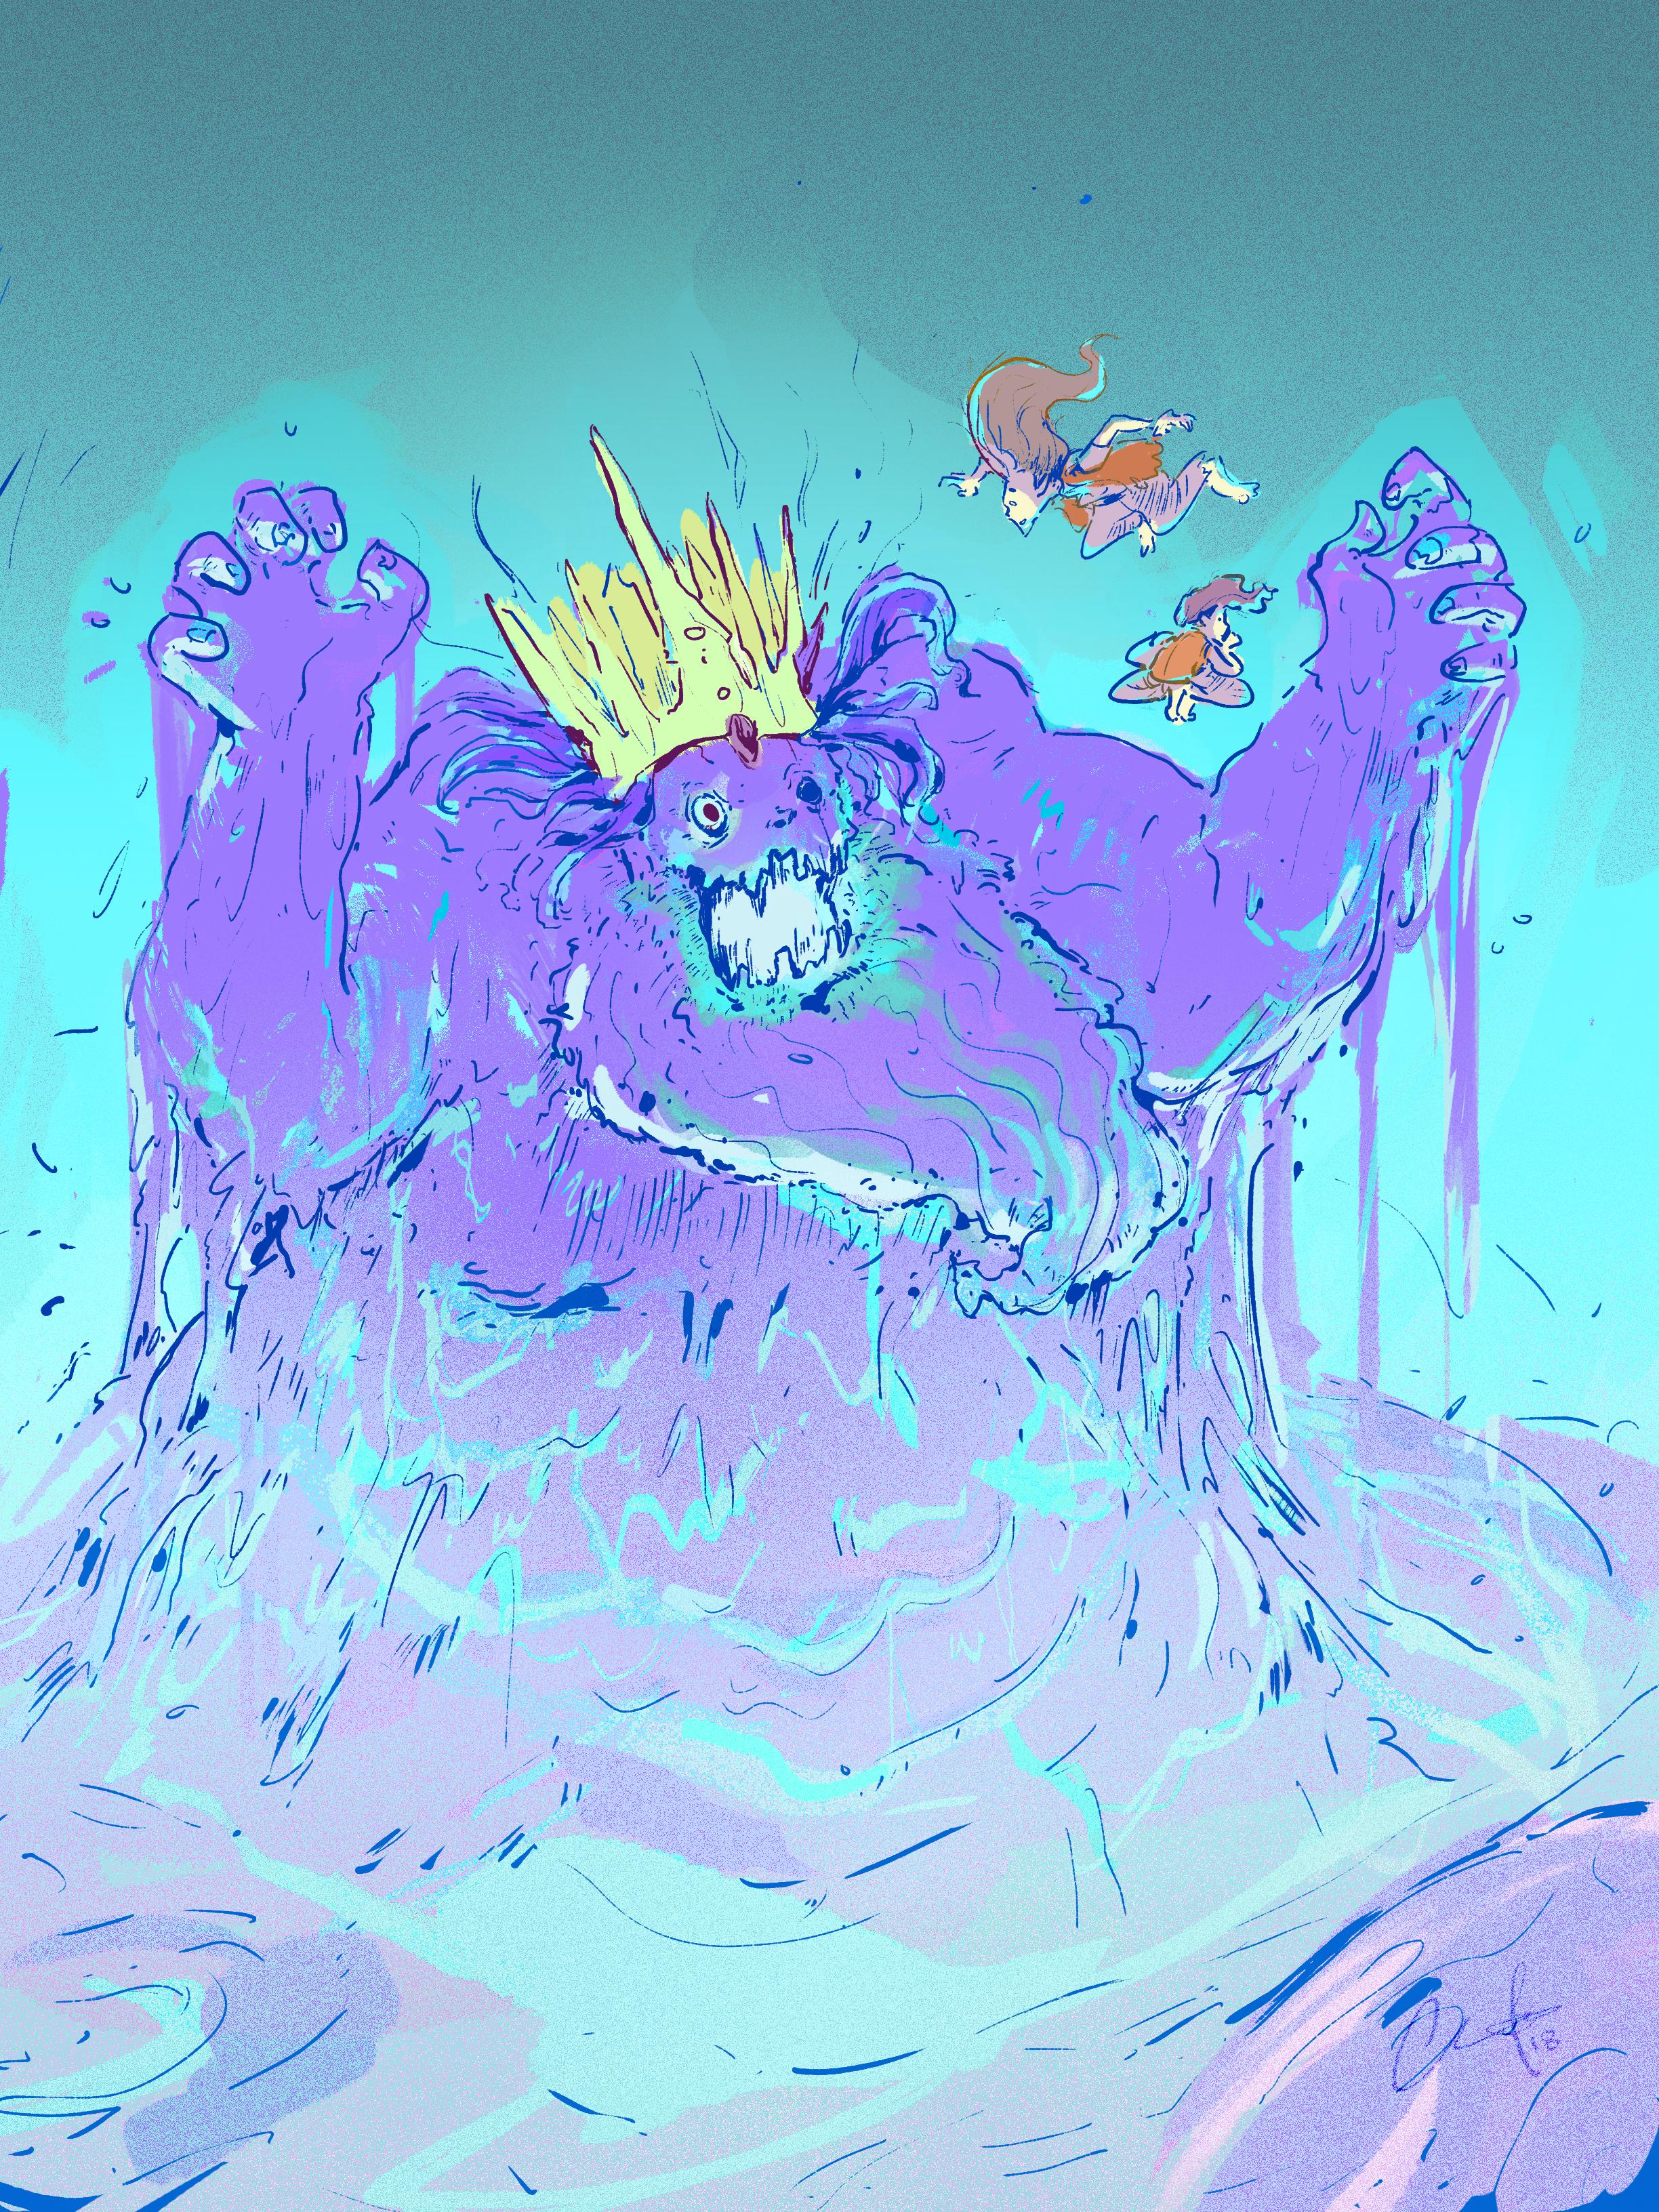 The Diwatan Brothers & The Gluttonous Wraith King